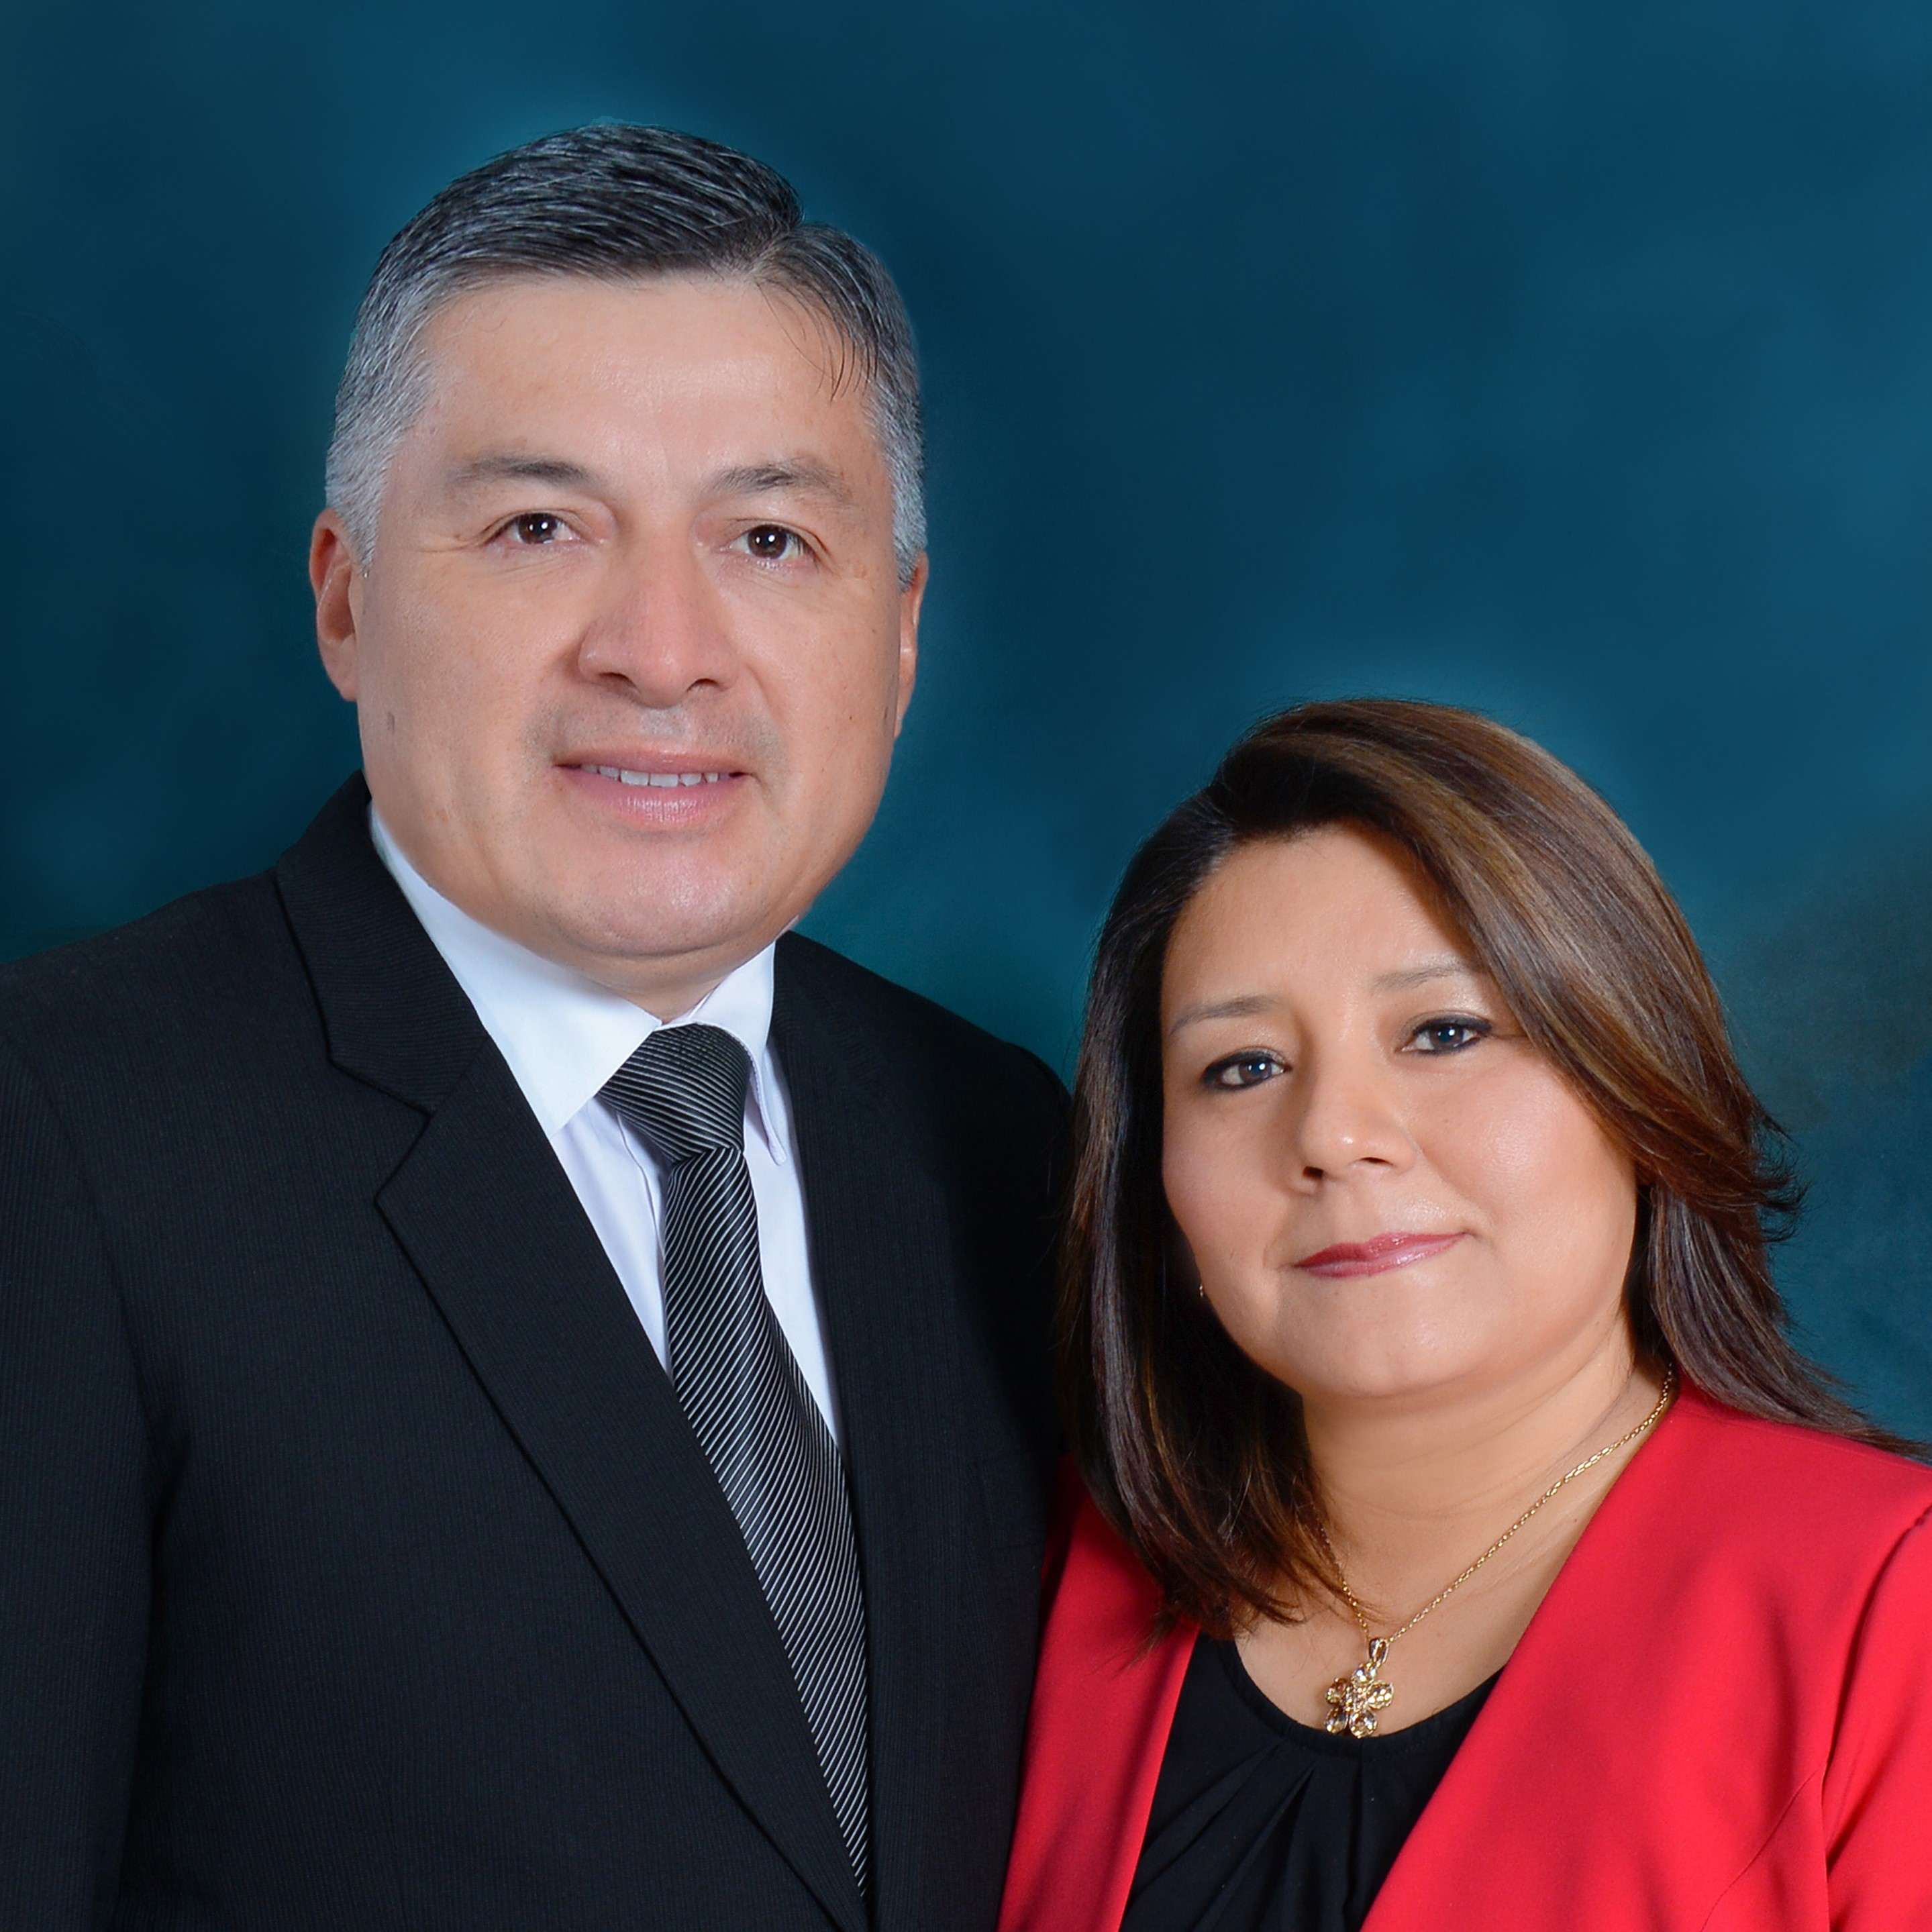 Fernando García Carrion and Carol G. Moreno de García